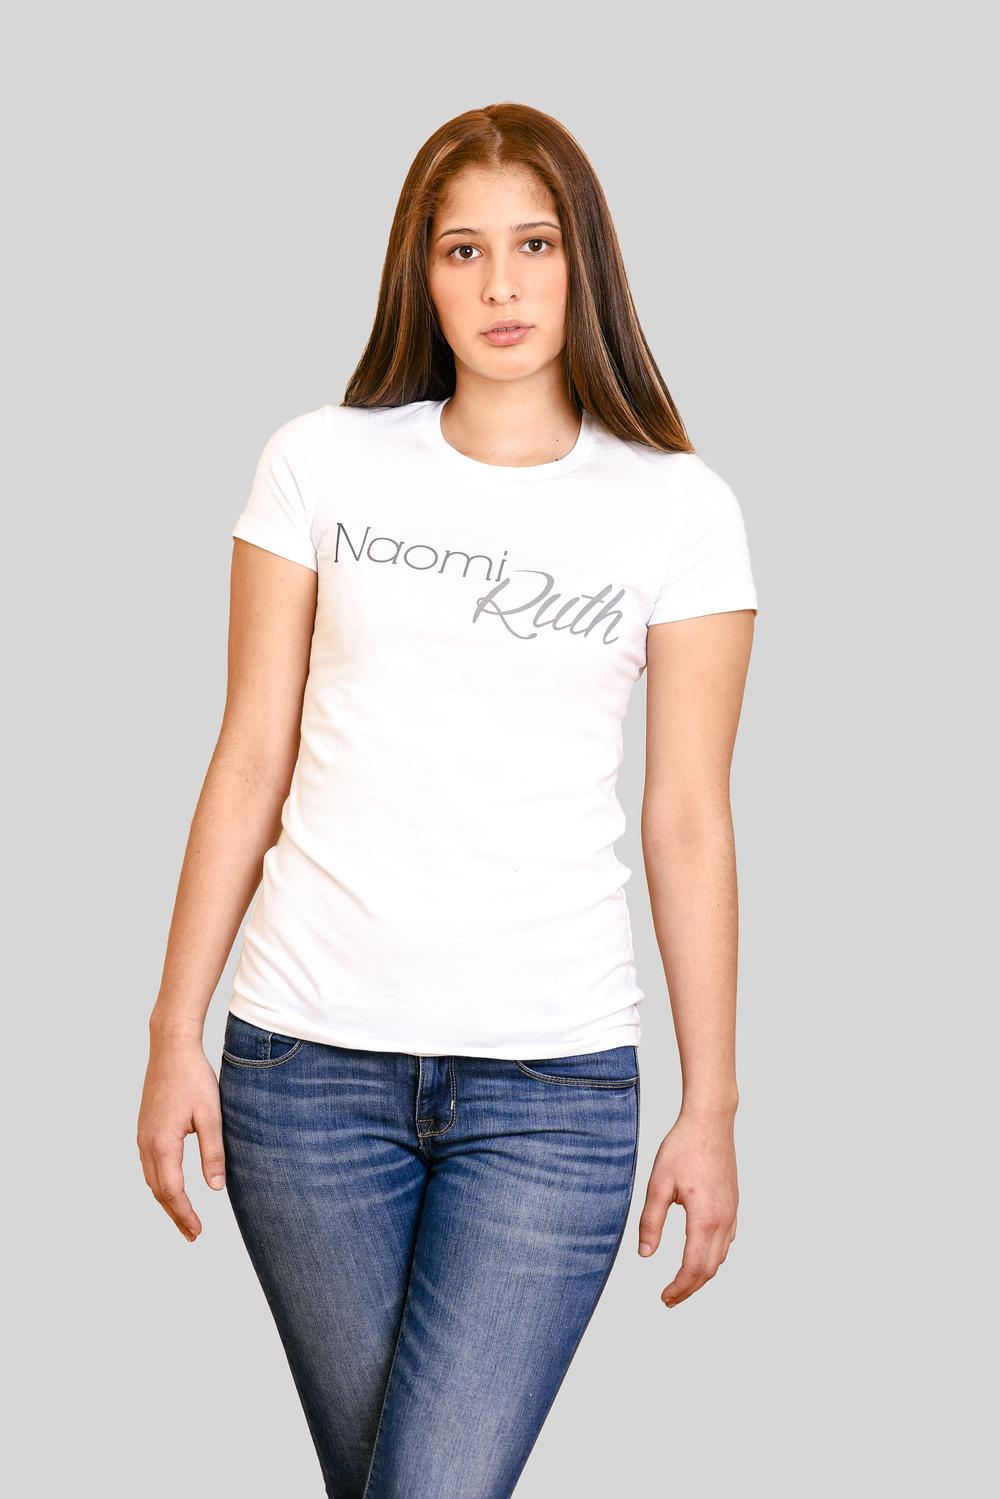 naomi ruth women u0027s apparel by emerging designers